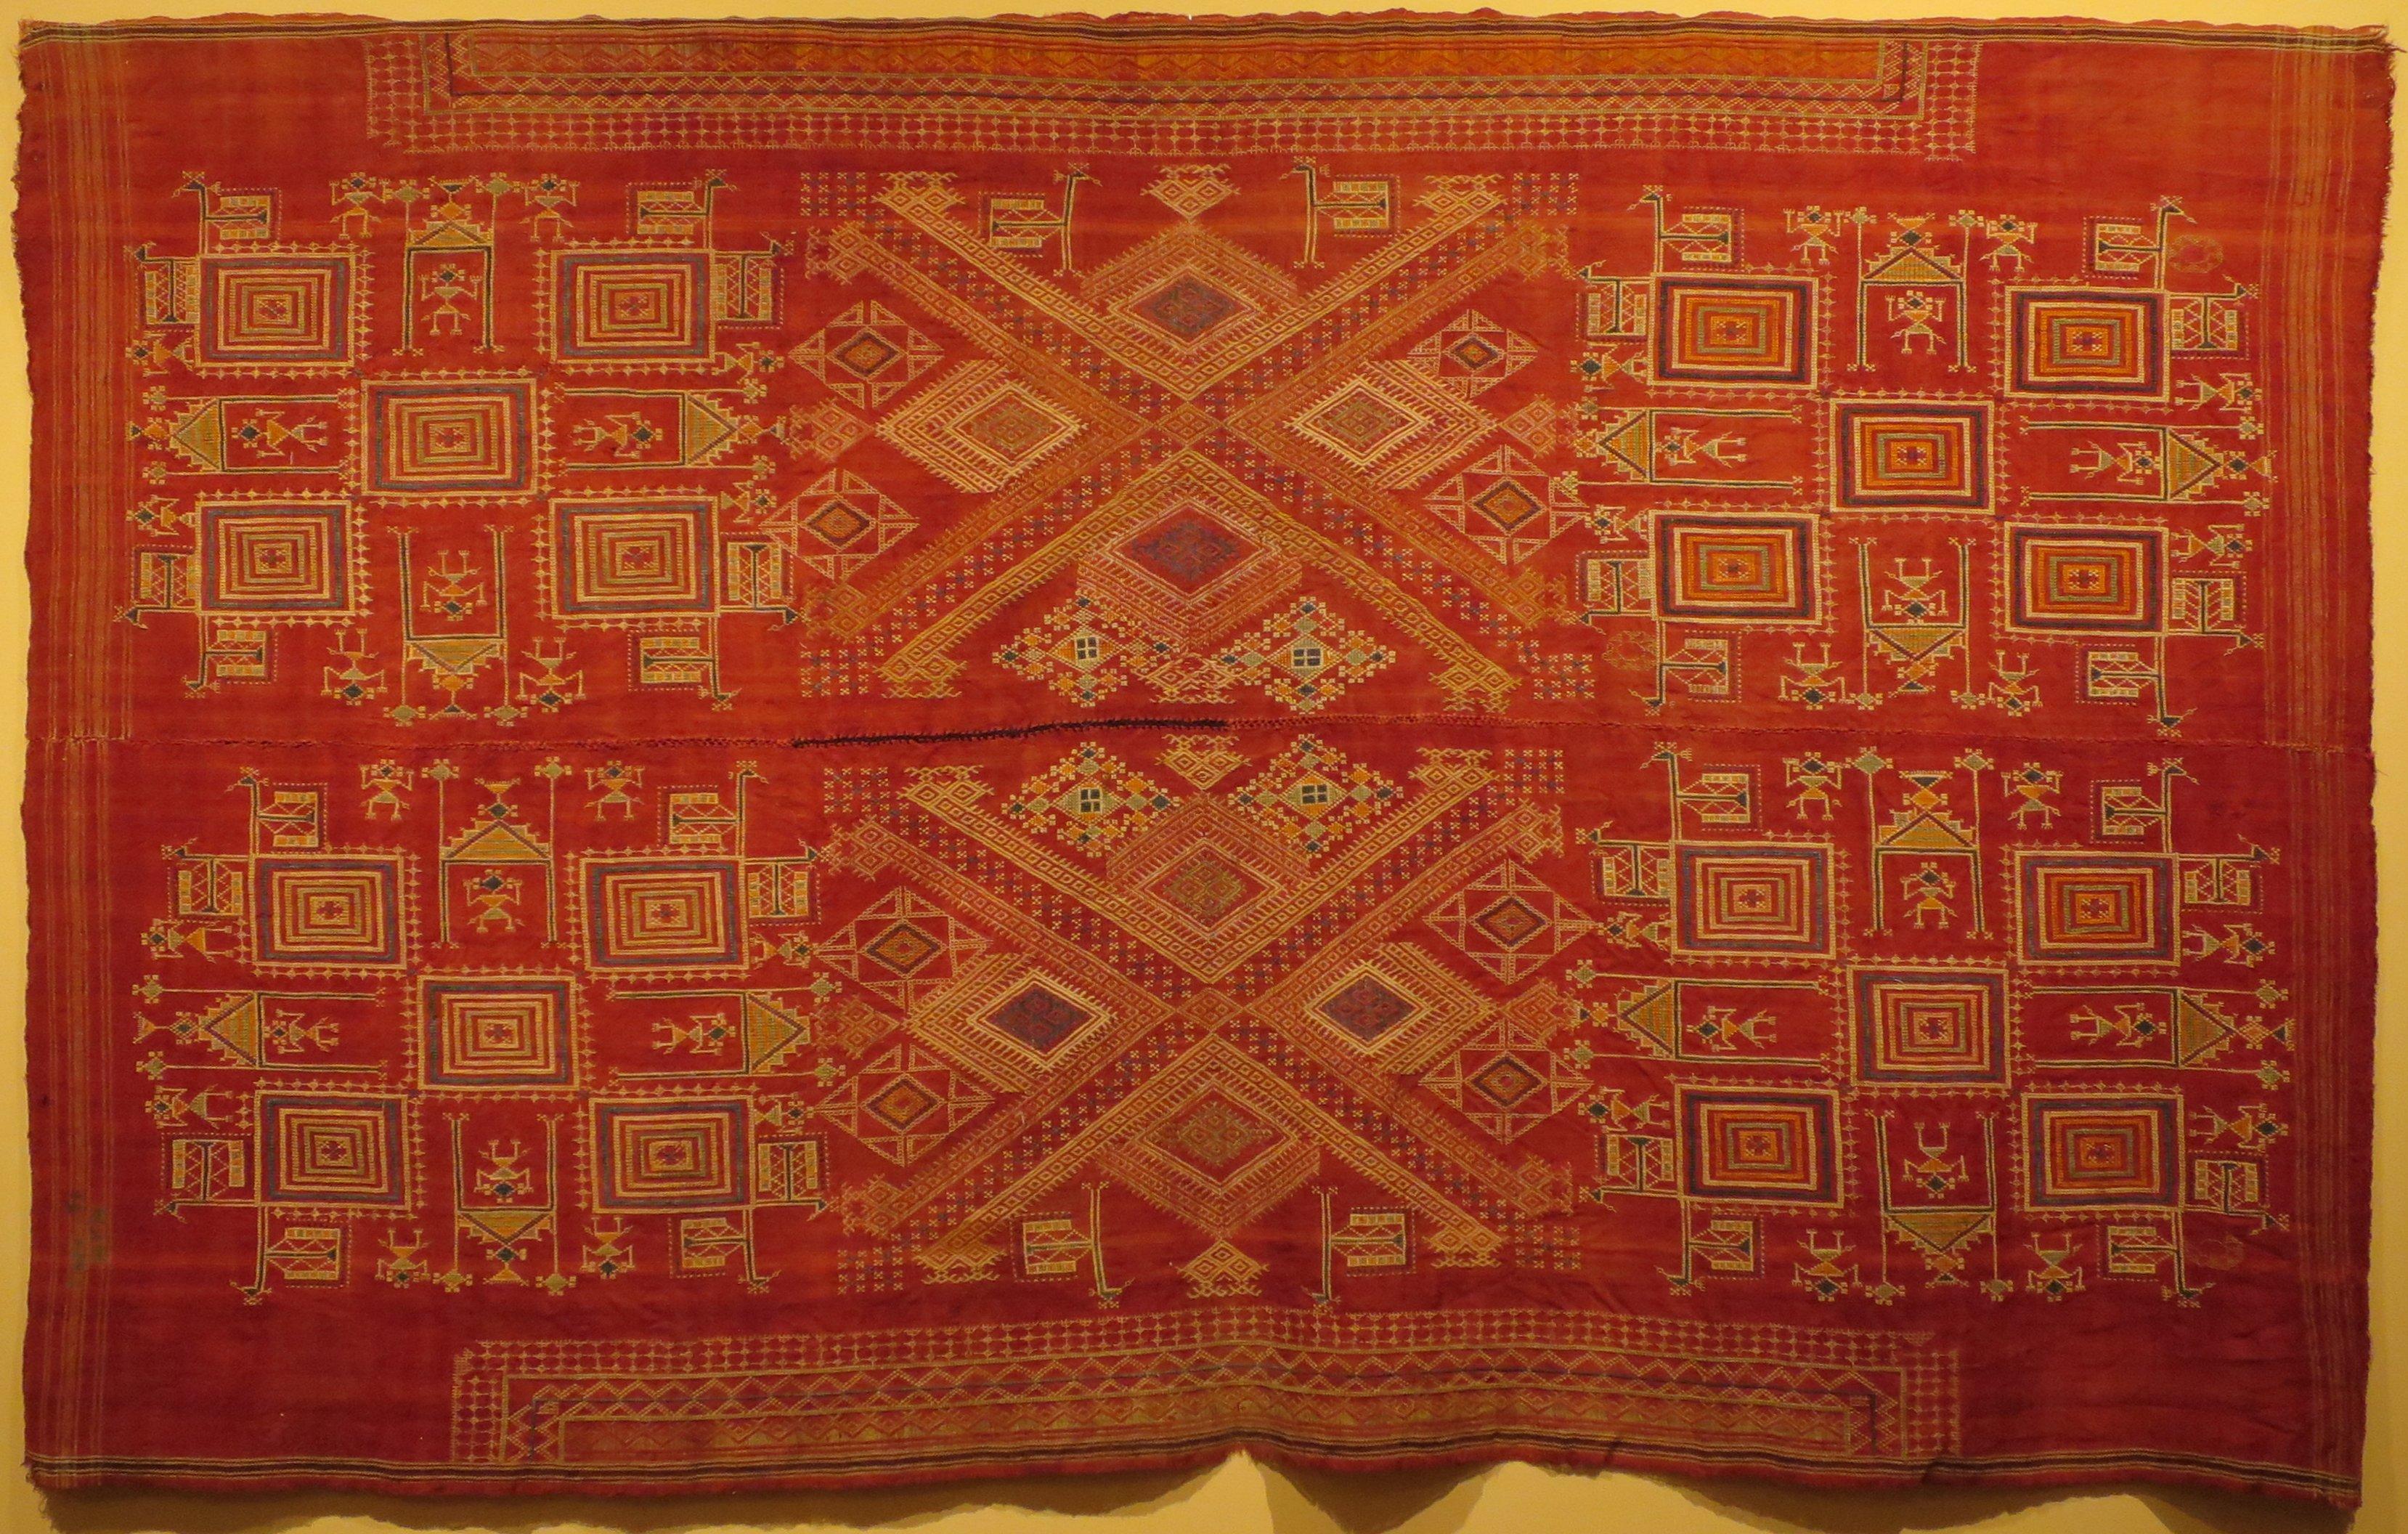 File:Ohdani (wedding shawl), India, Rajasthan, Bikaner, 19th century